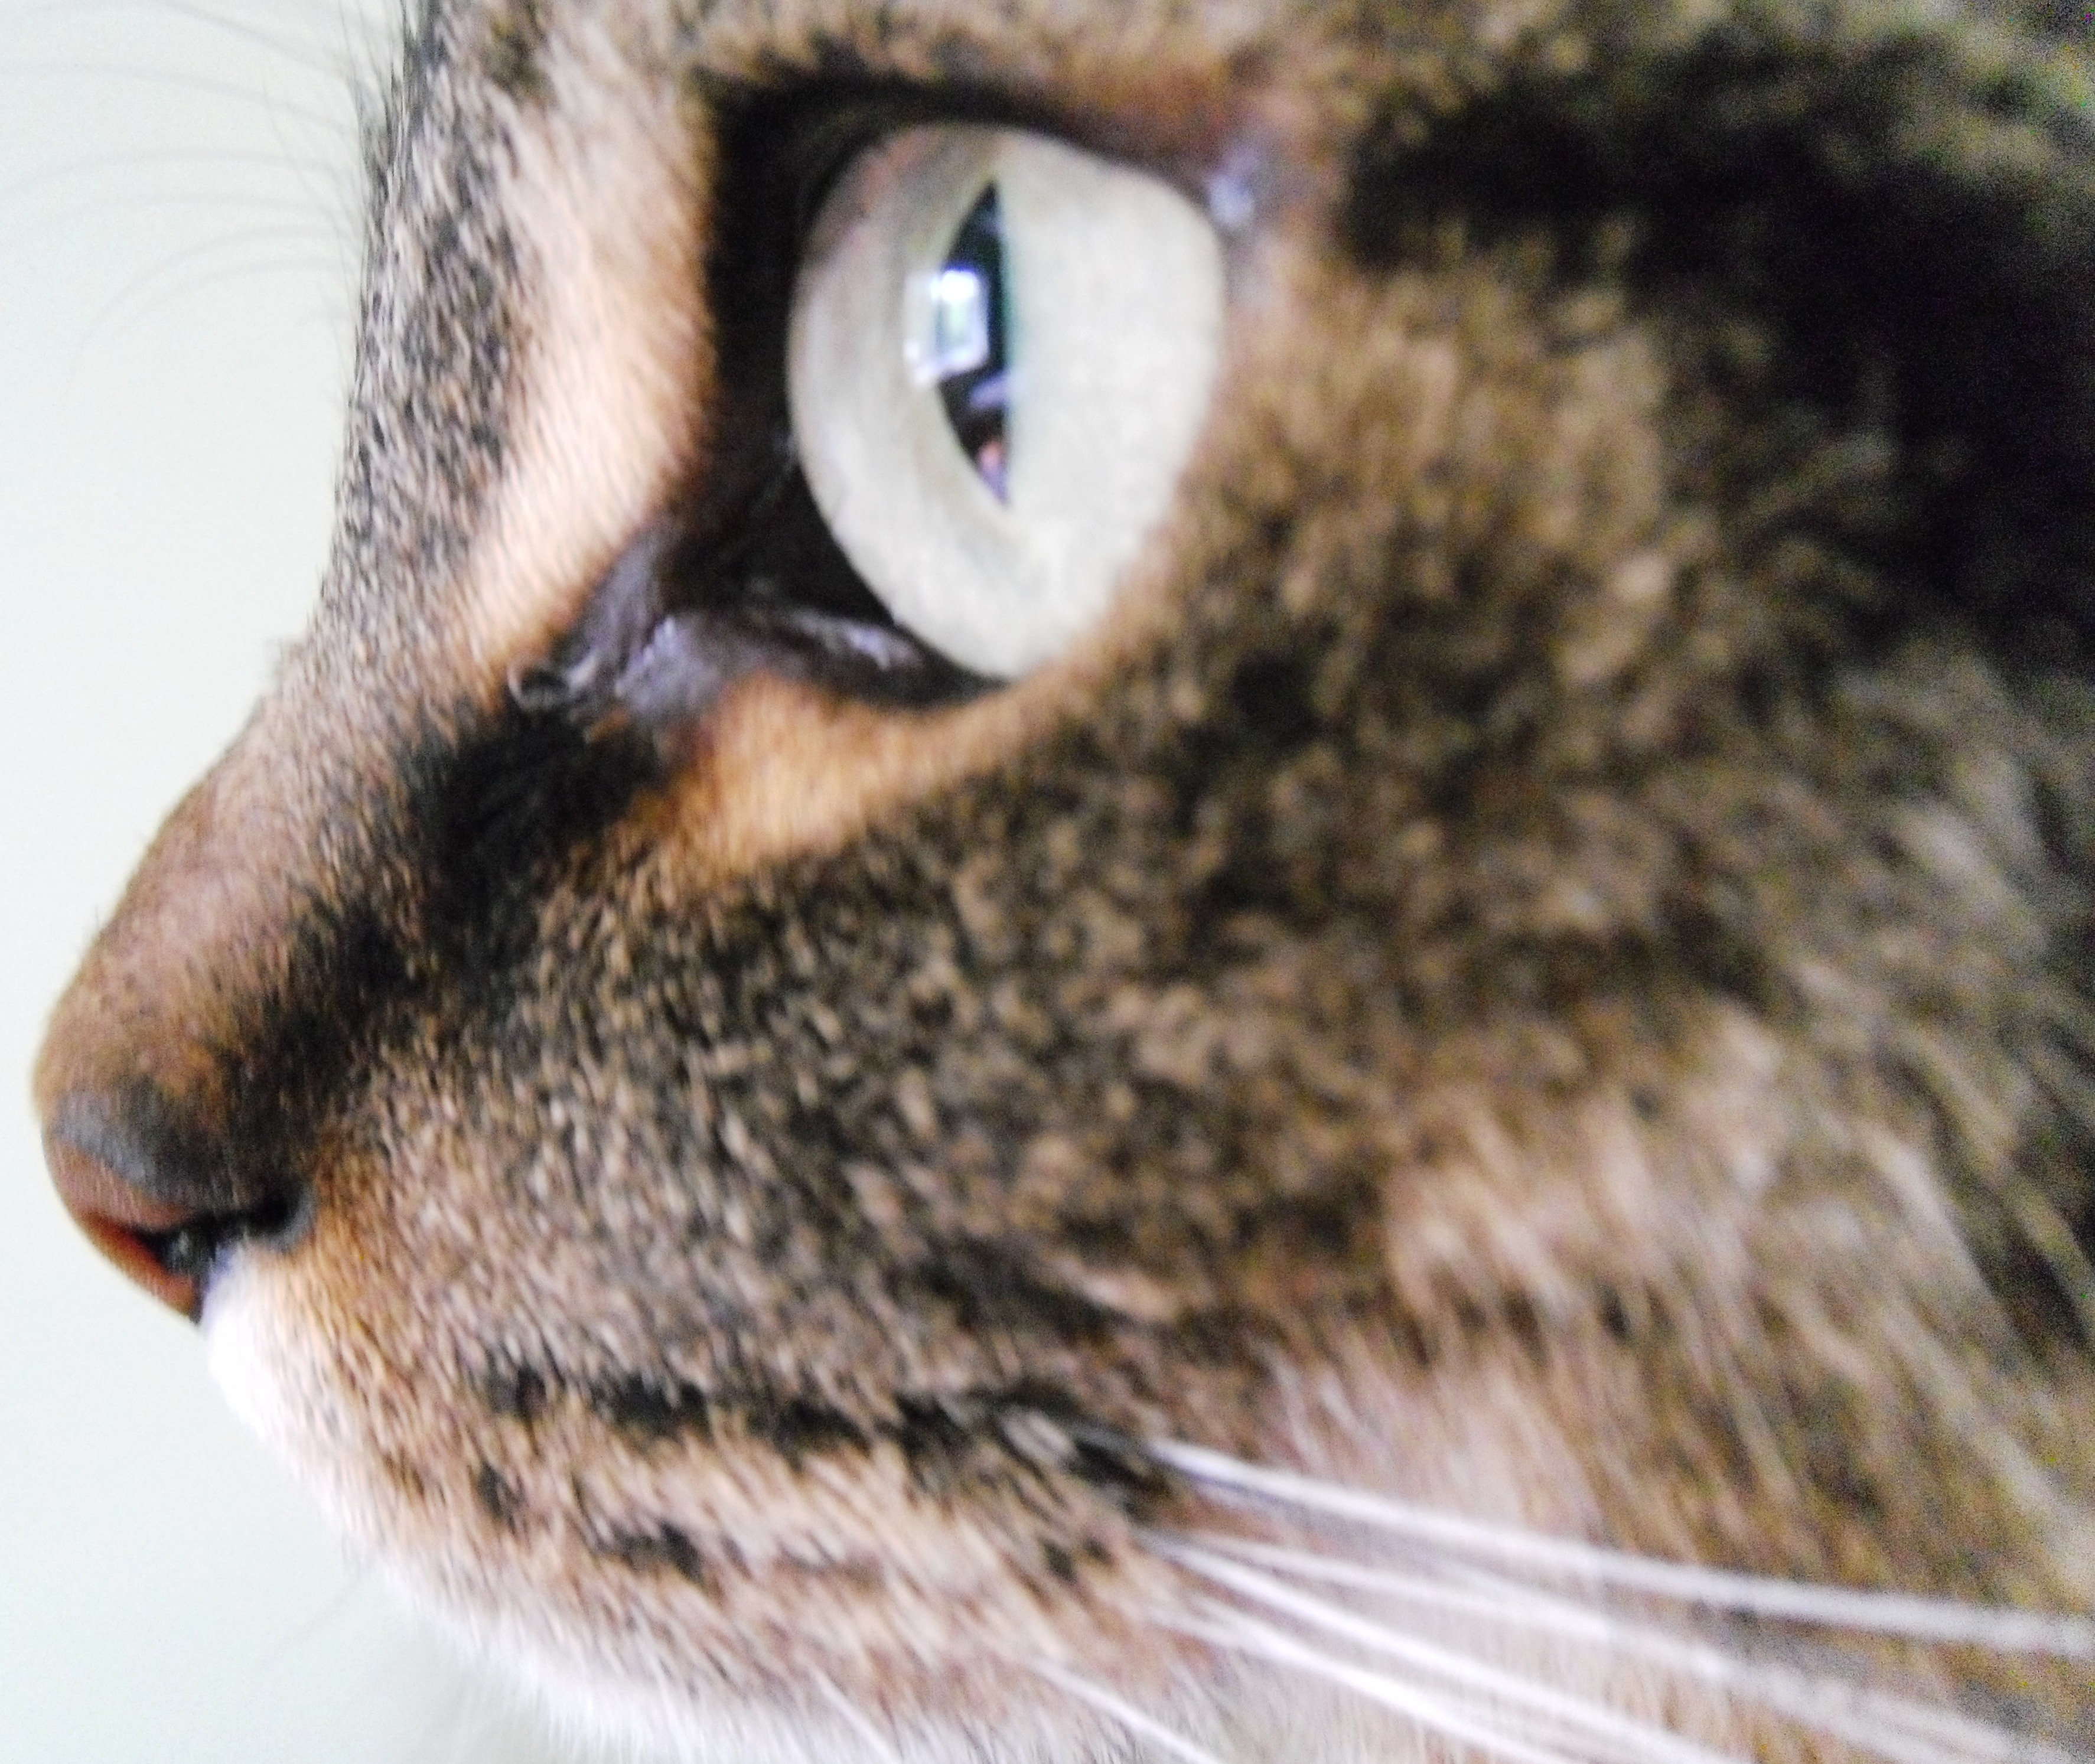 3547x2987 Cat Face Profile Teen Photograph About Animals, Nature, Cat, Cat